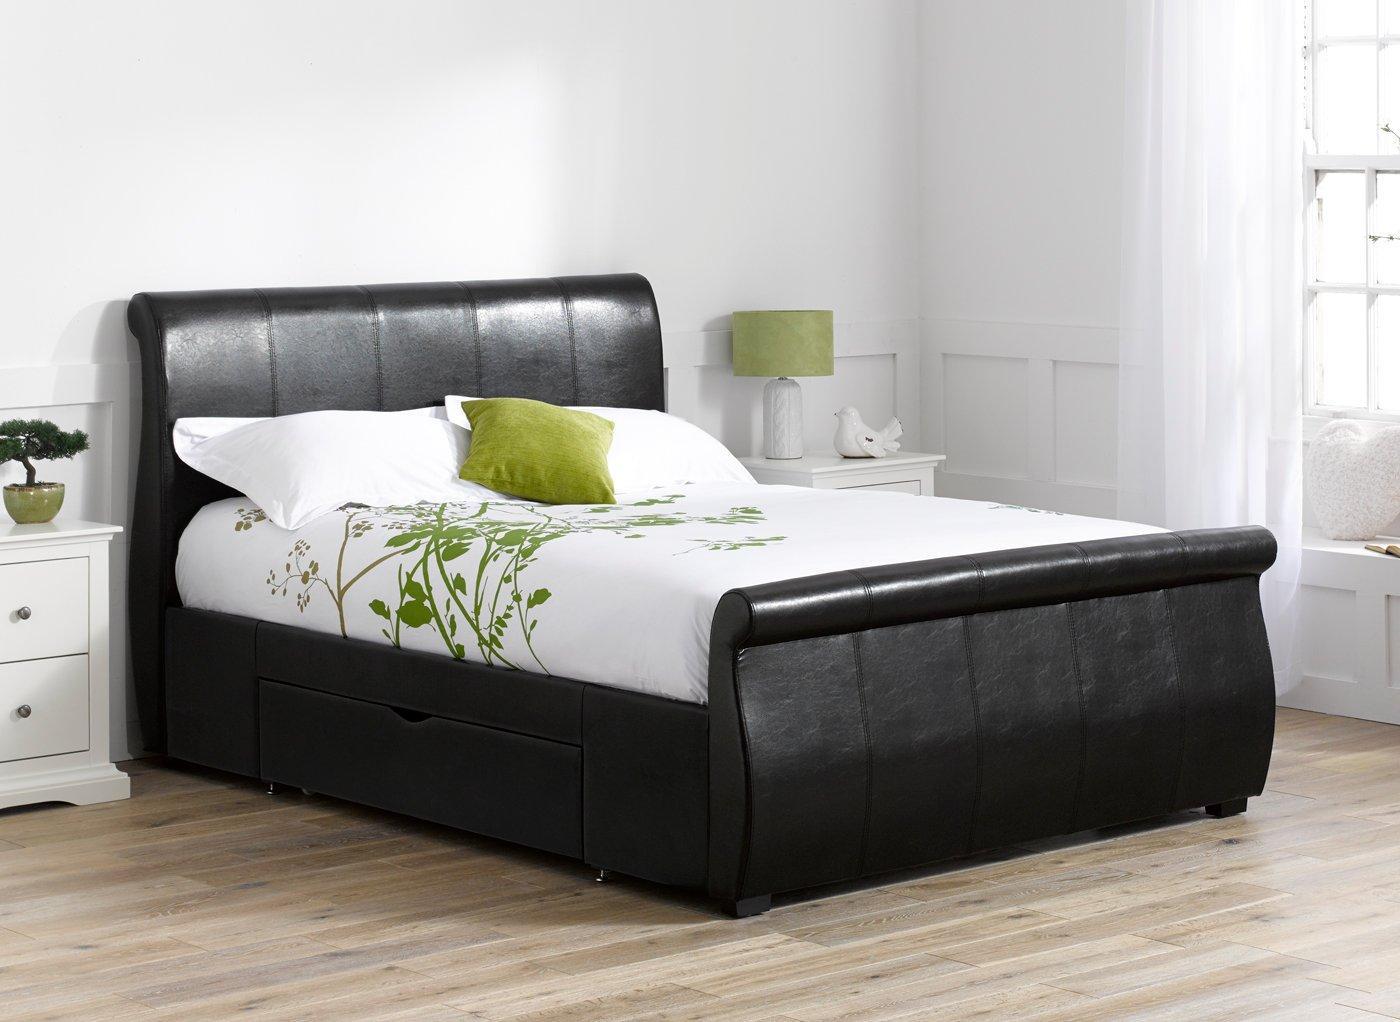 Manhattan Black Bonded Leather Upholstered Bed Frame 4'6 Double